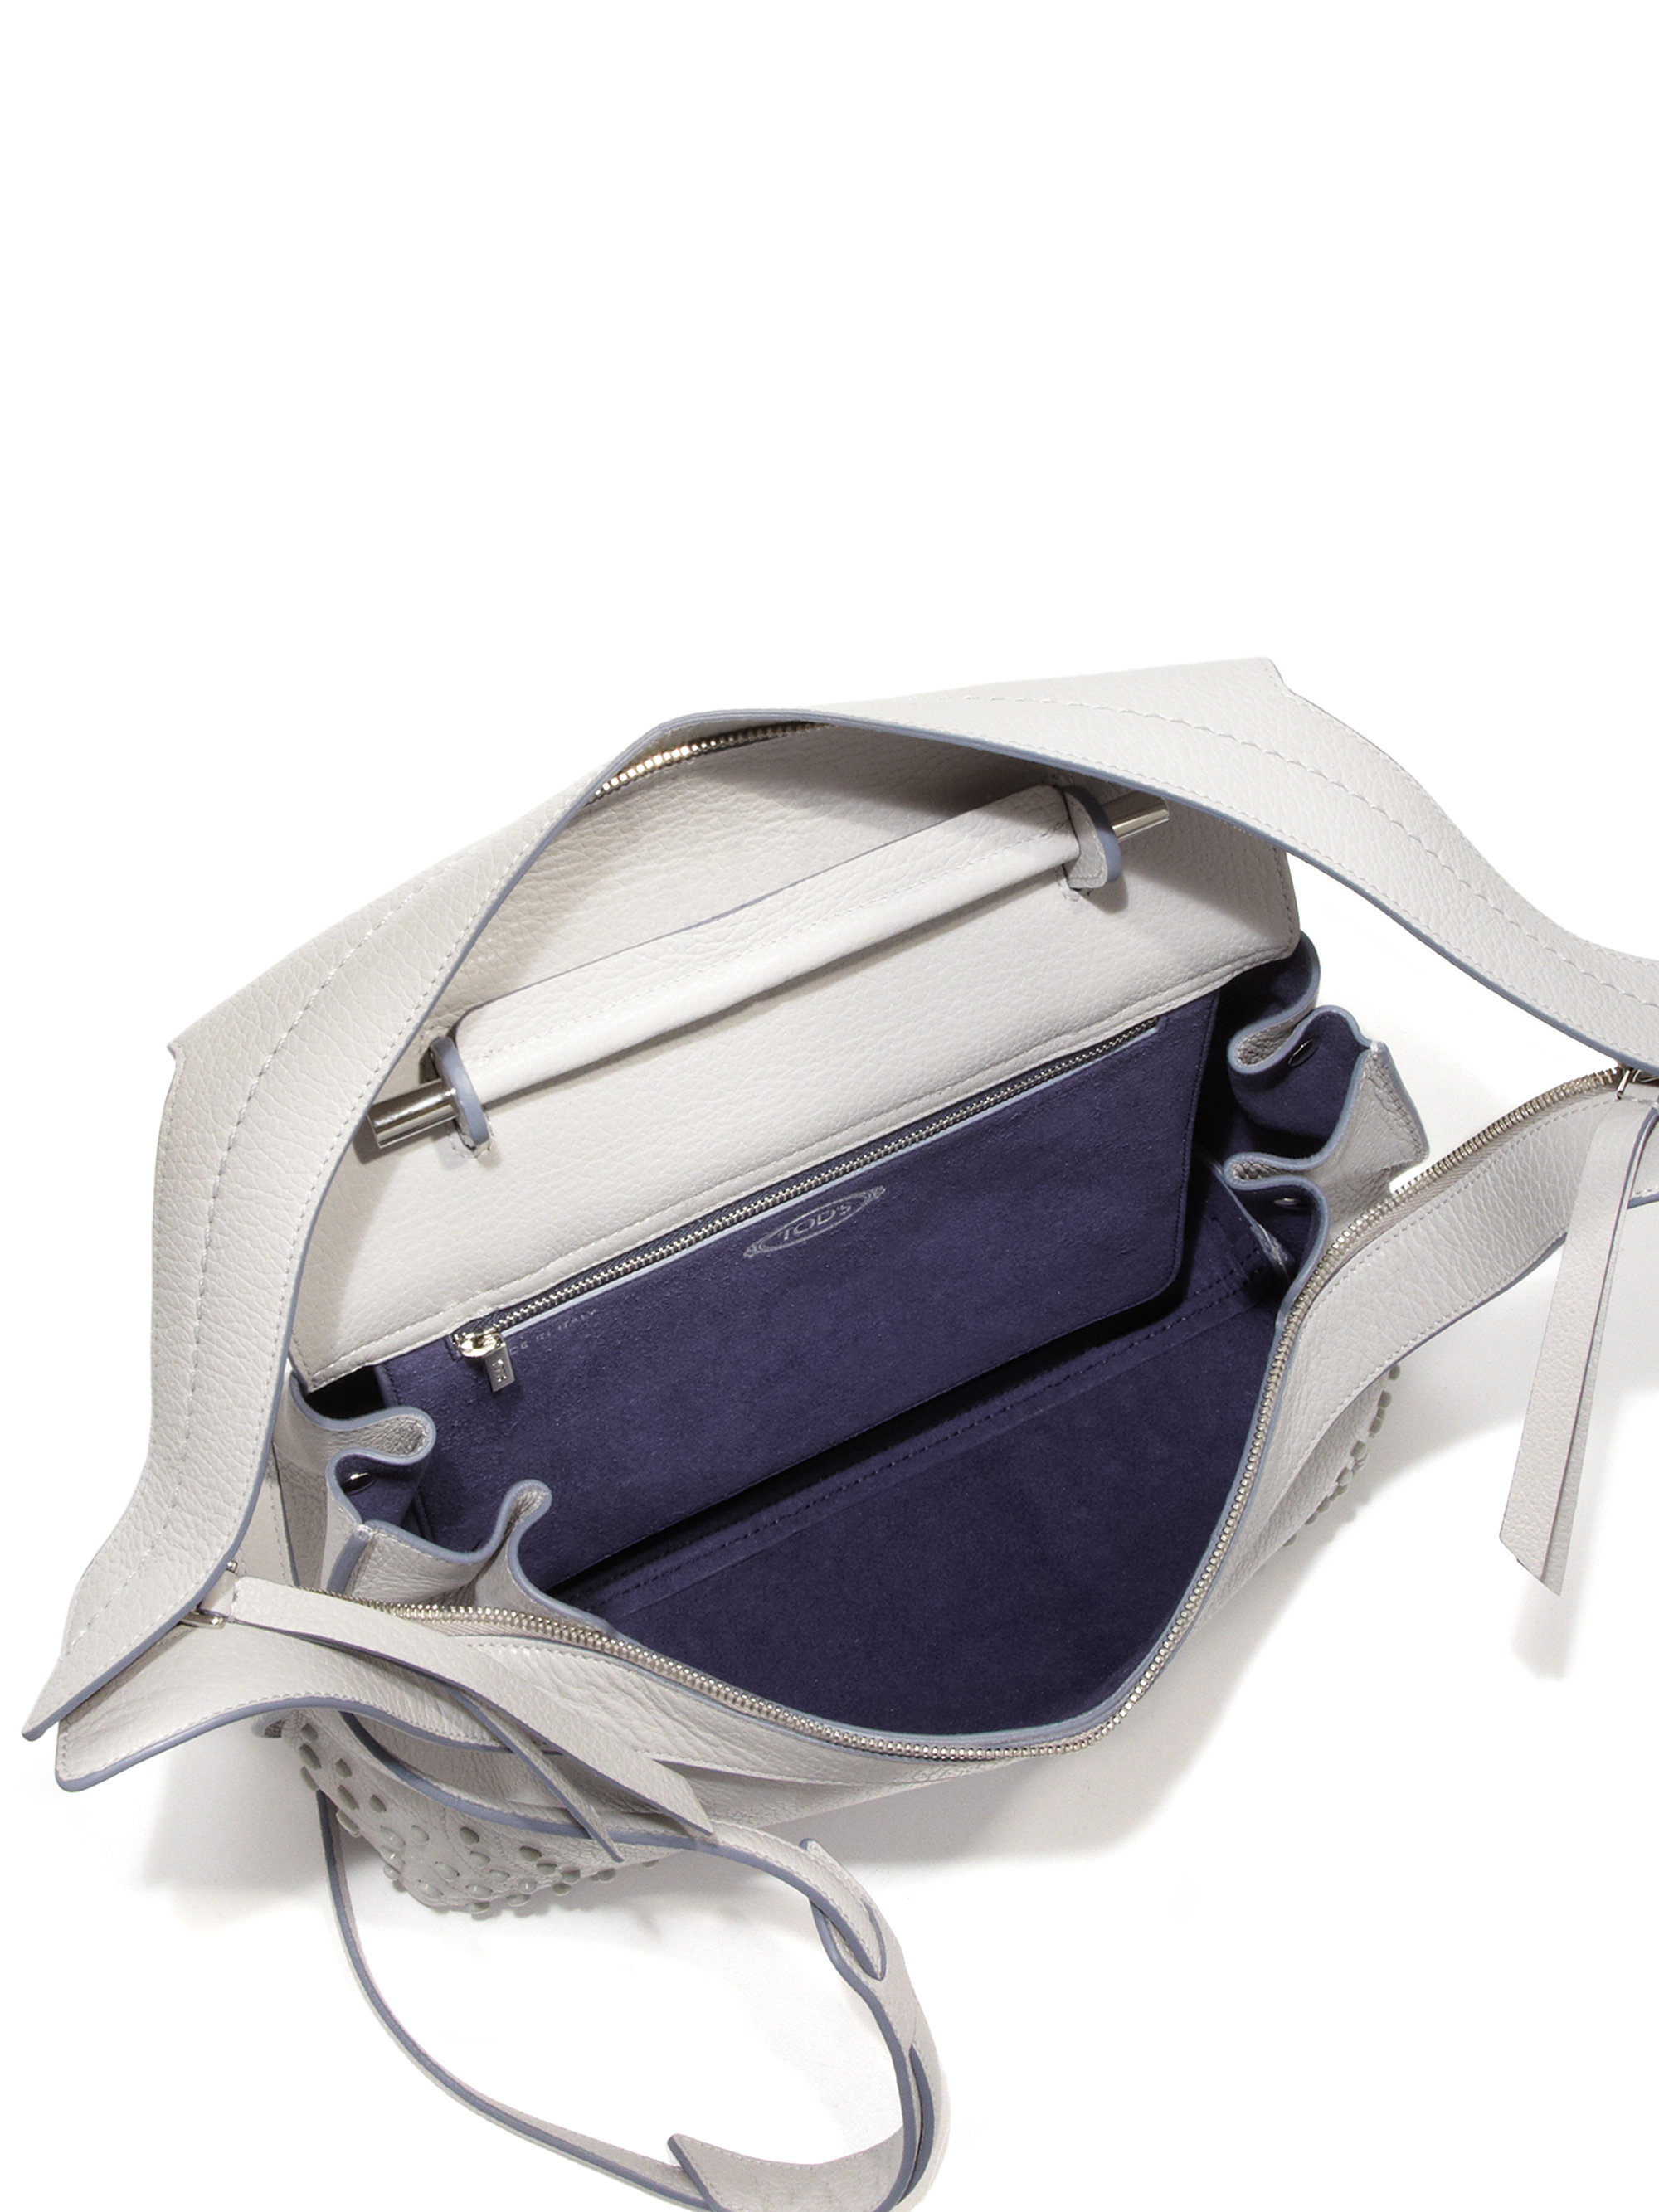 Tod\u0026#39;s Wave Medium Gommini Leather Satchel in Gray (light grey)   Lyst